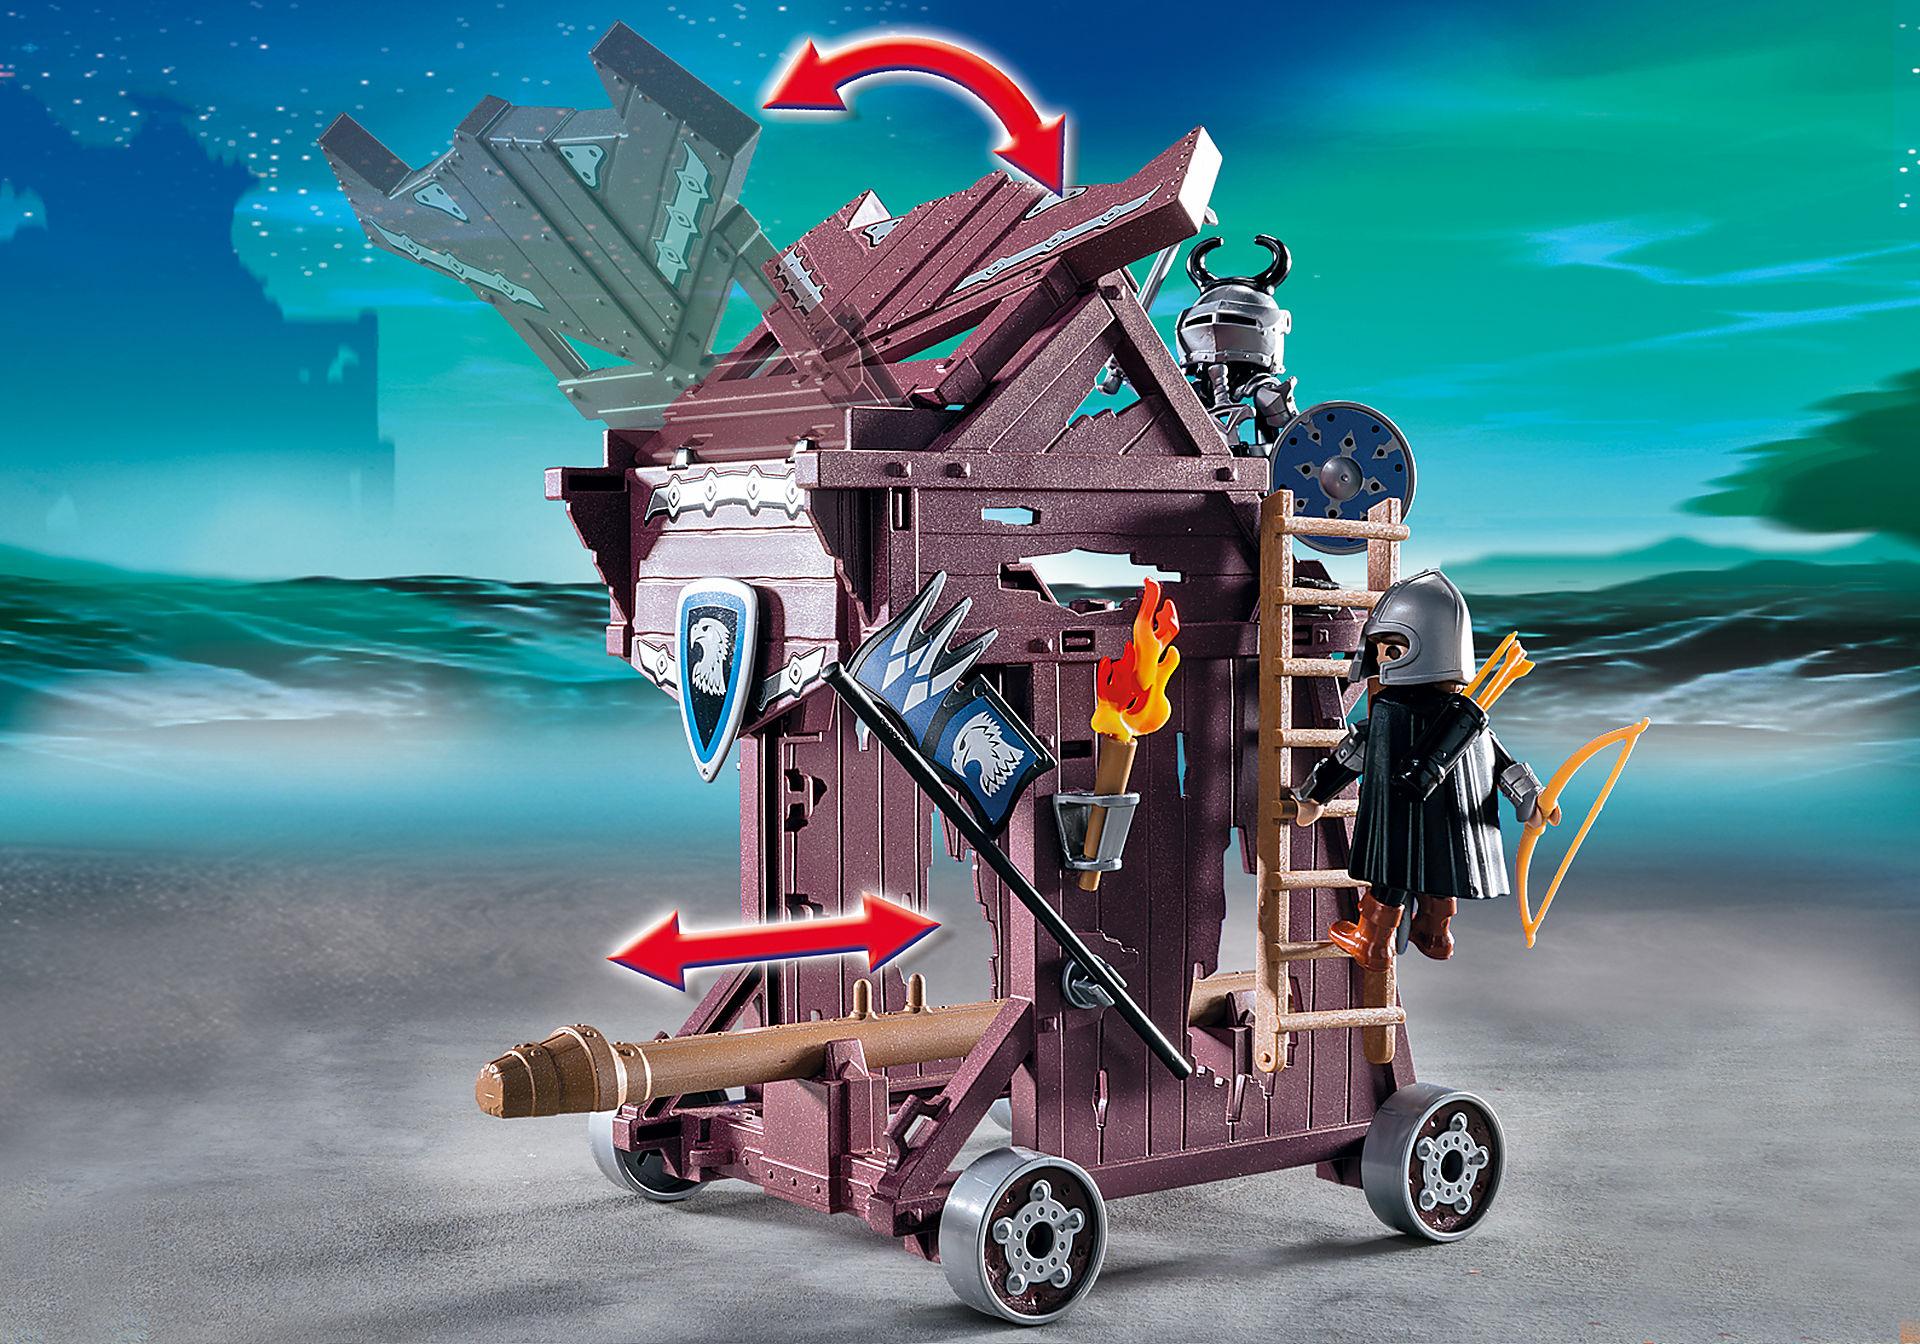 http://media.playmobil.com/i/playmobil/6628_product_extra2/Aanvalstoren van de Valkenridders